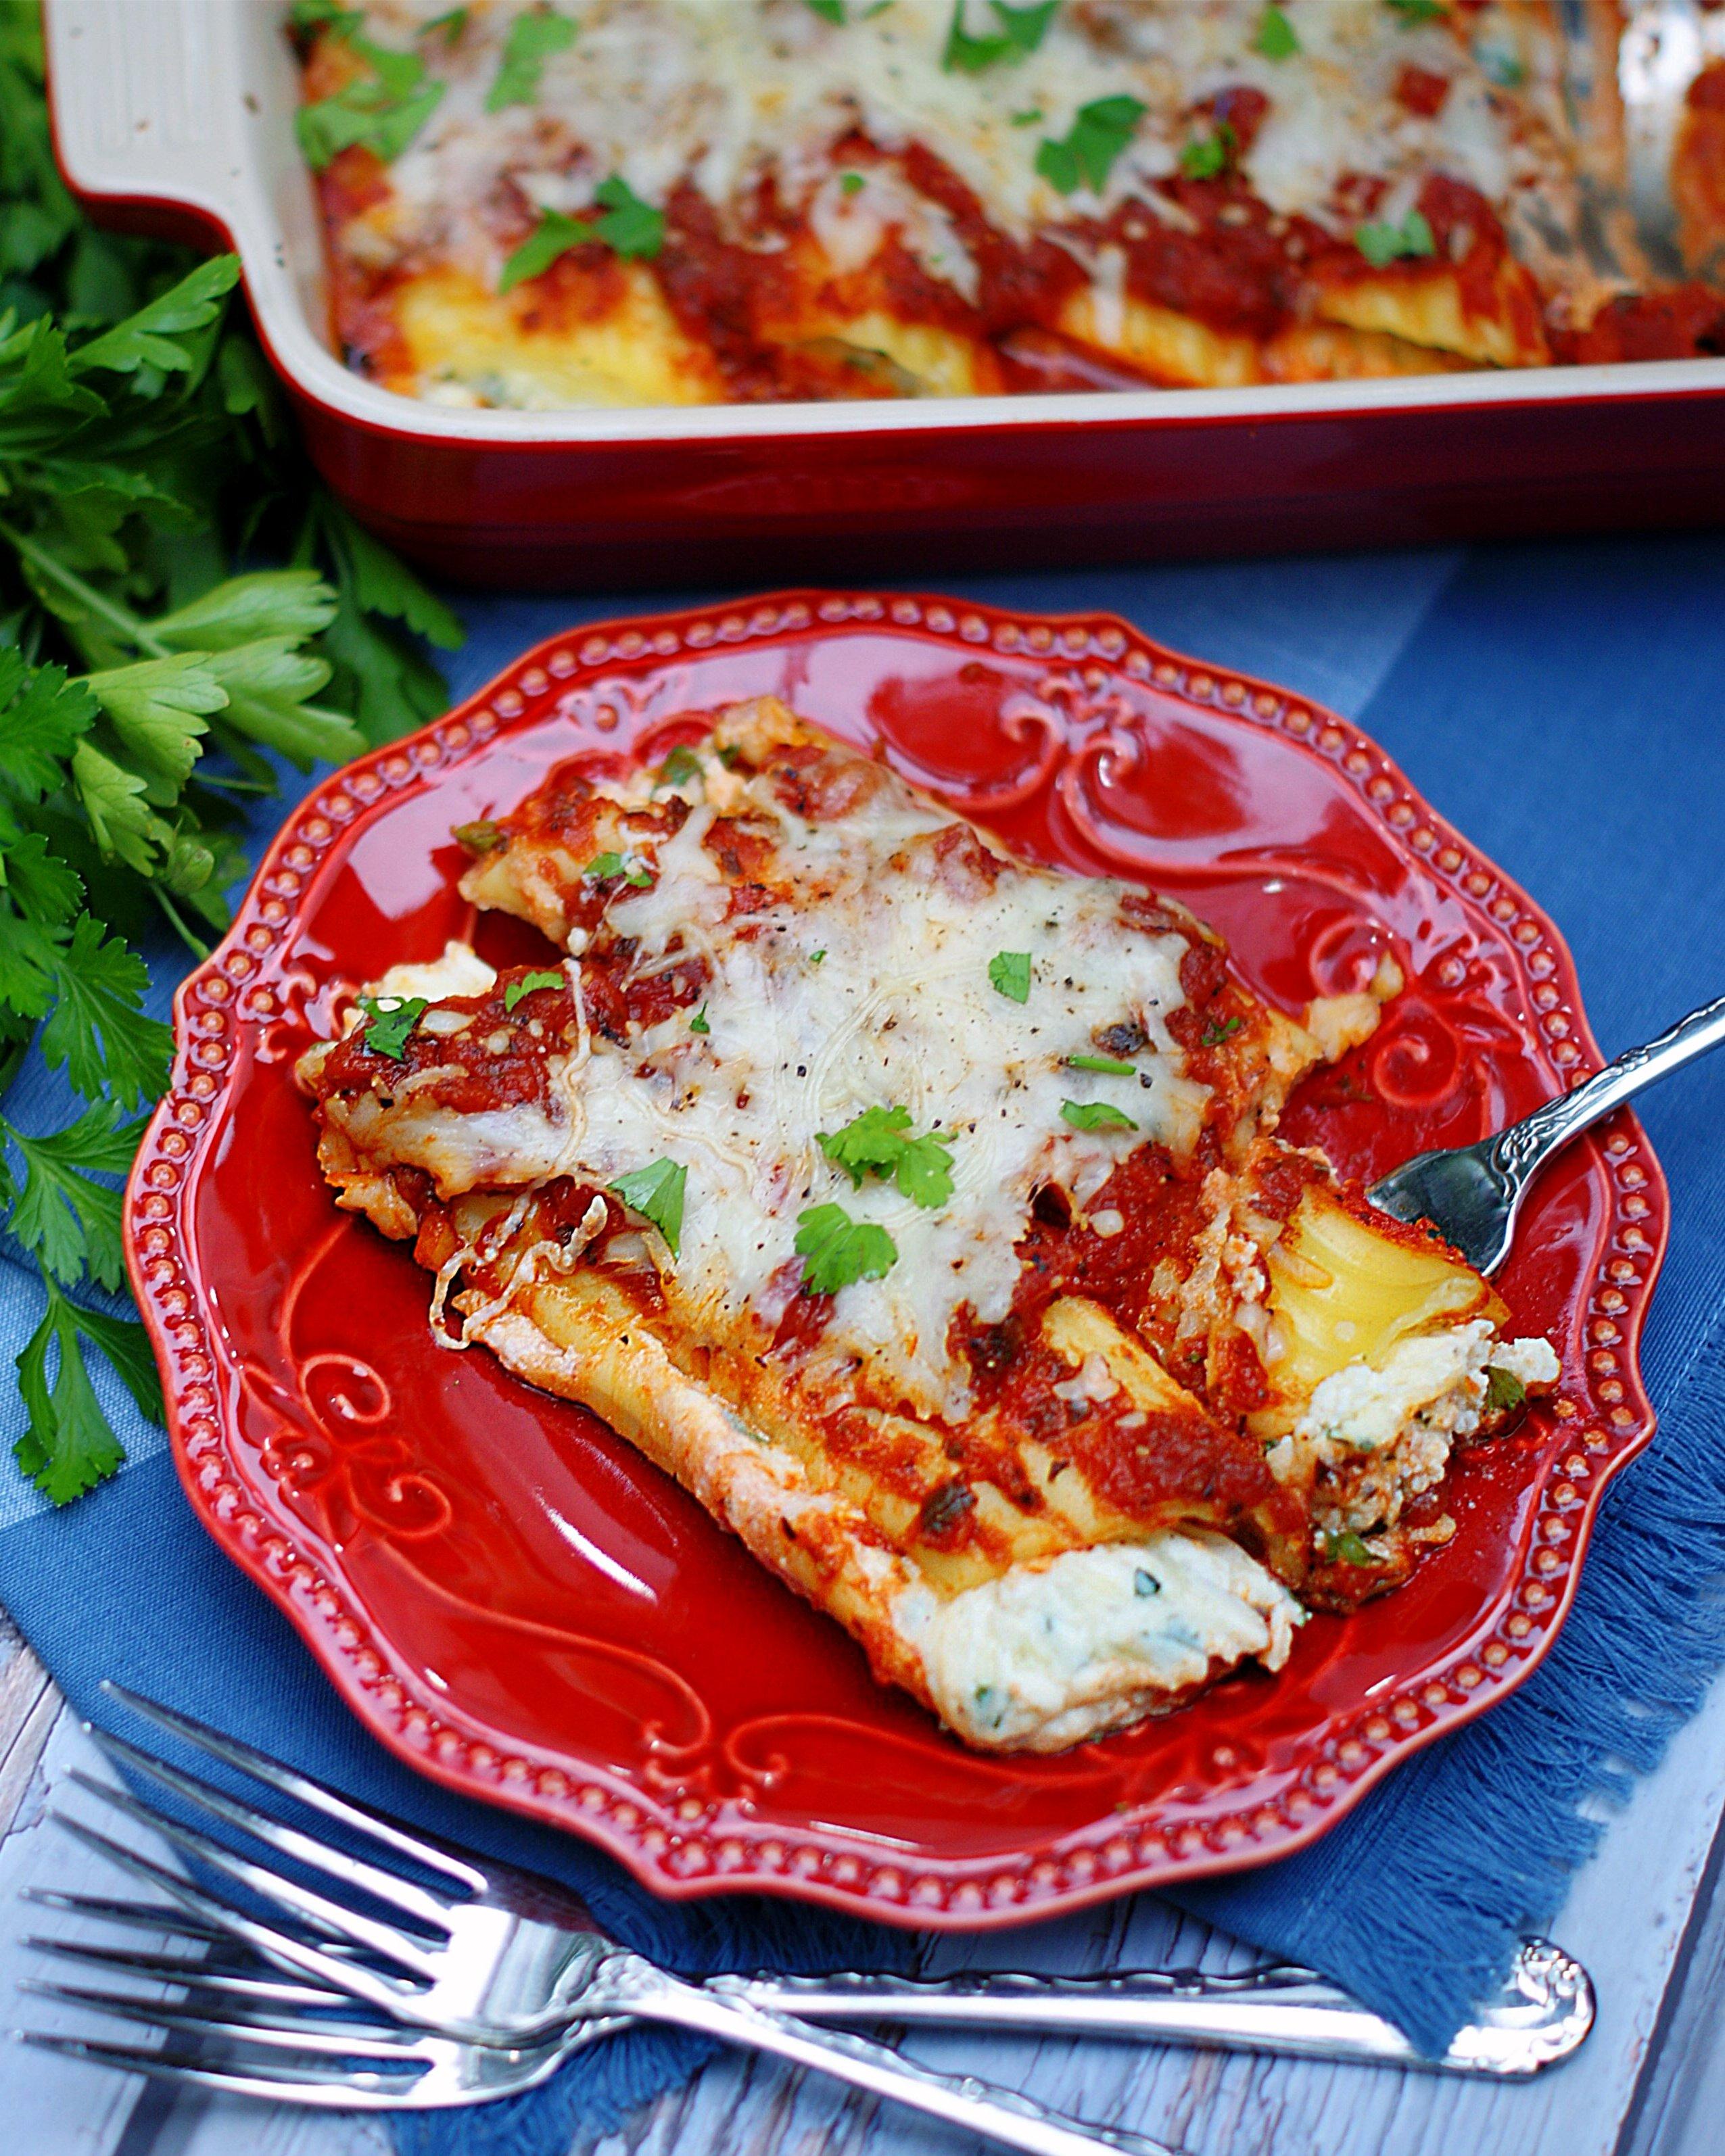 3 Cheese Manicotti on a plate